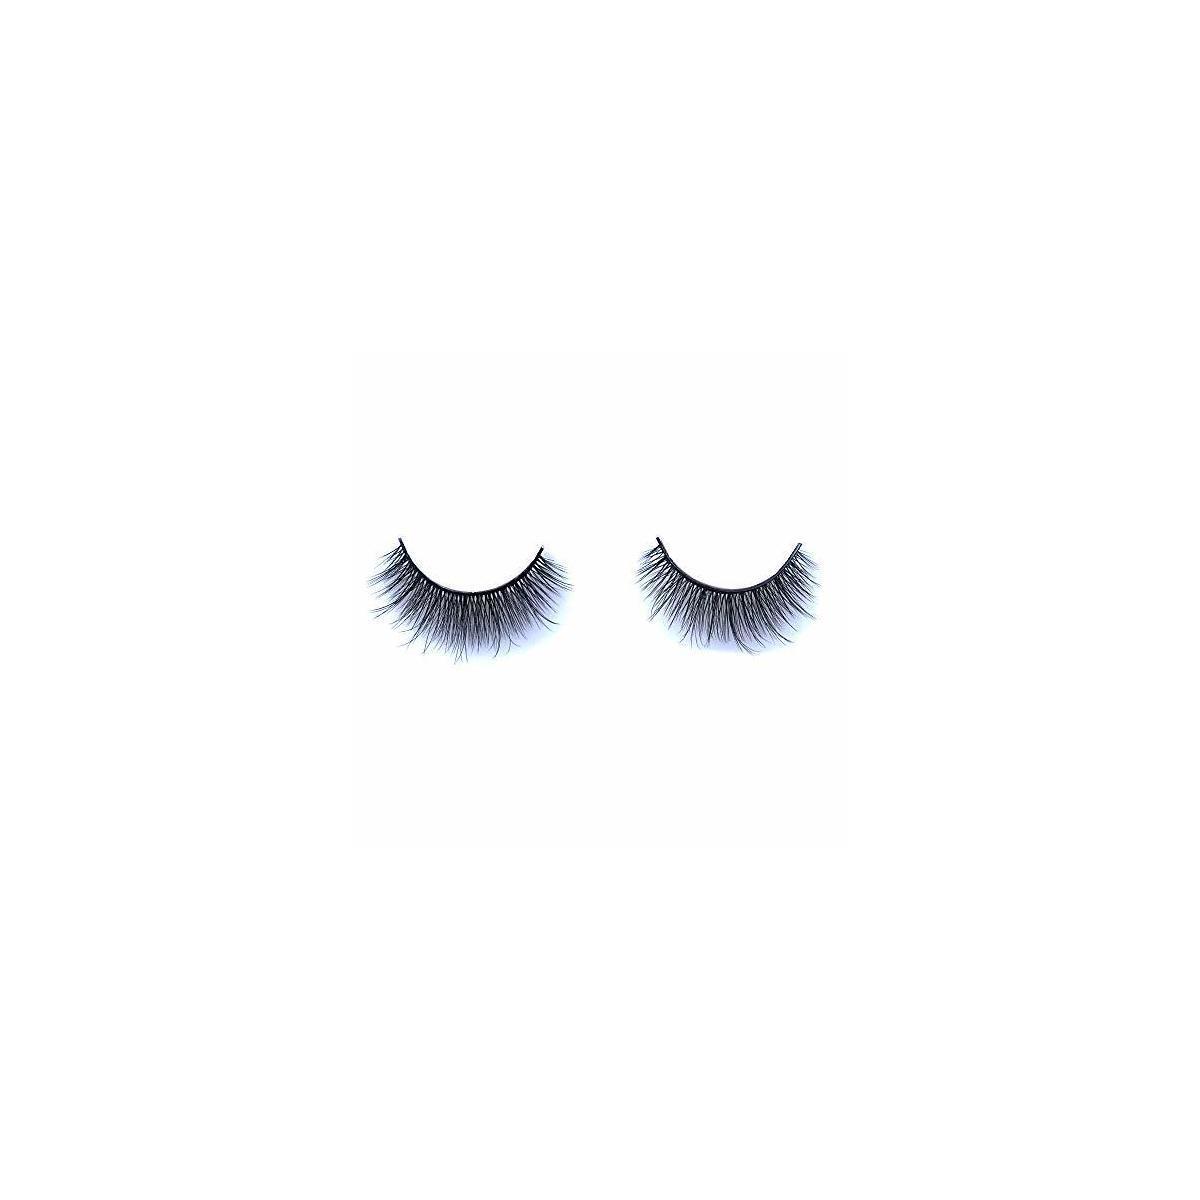 10 Pairs Natural Look Reusable Short Volume Fluffy Eyelashes Wispy Lashes